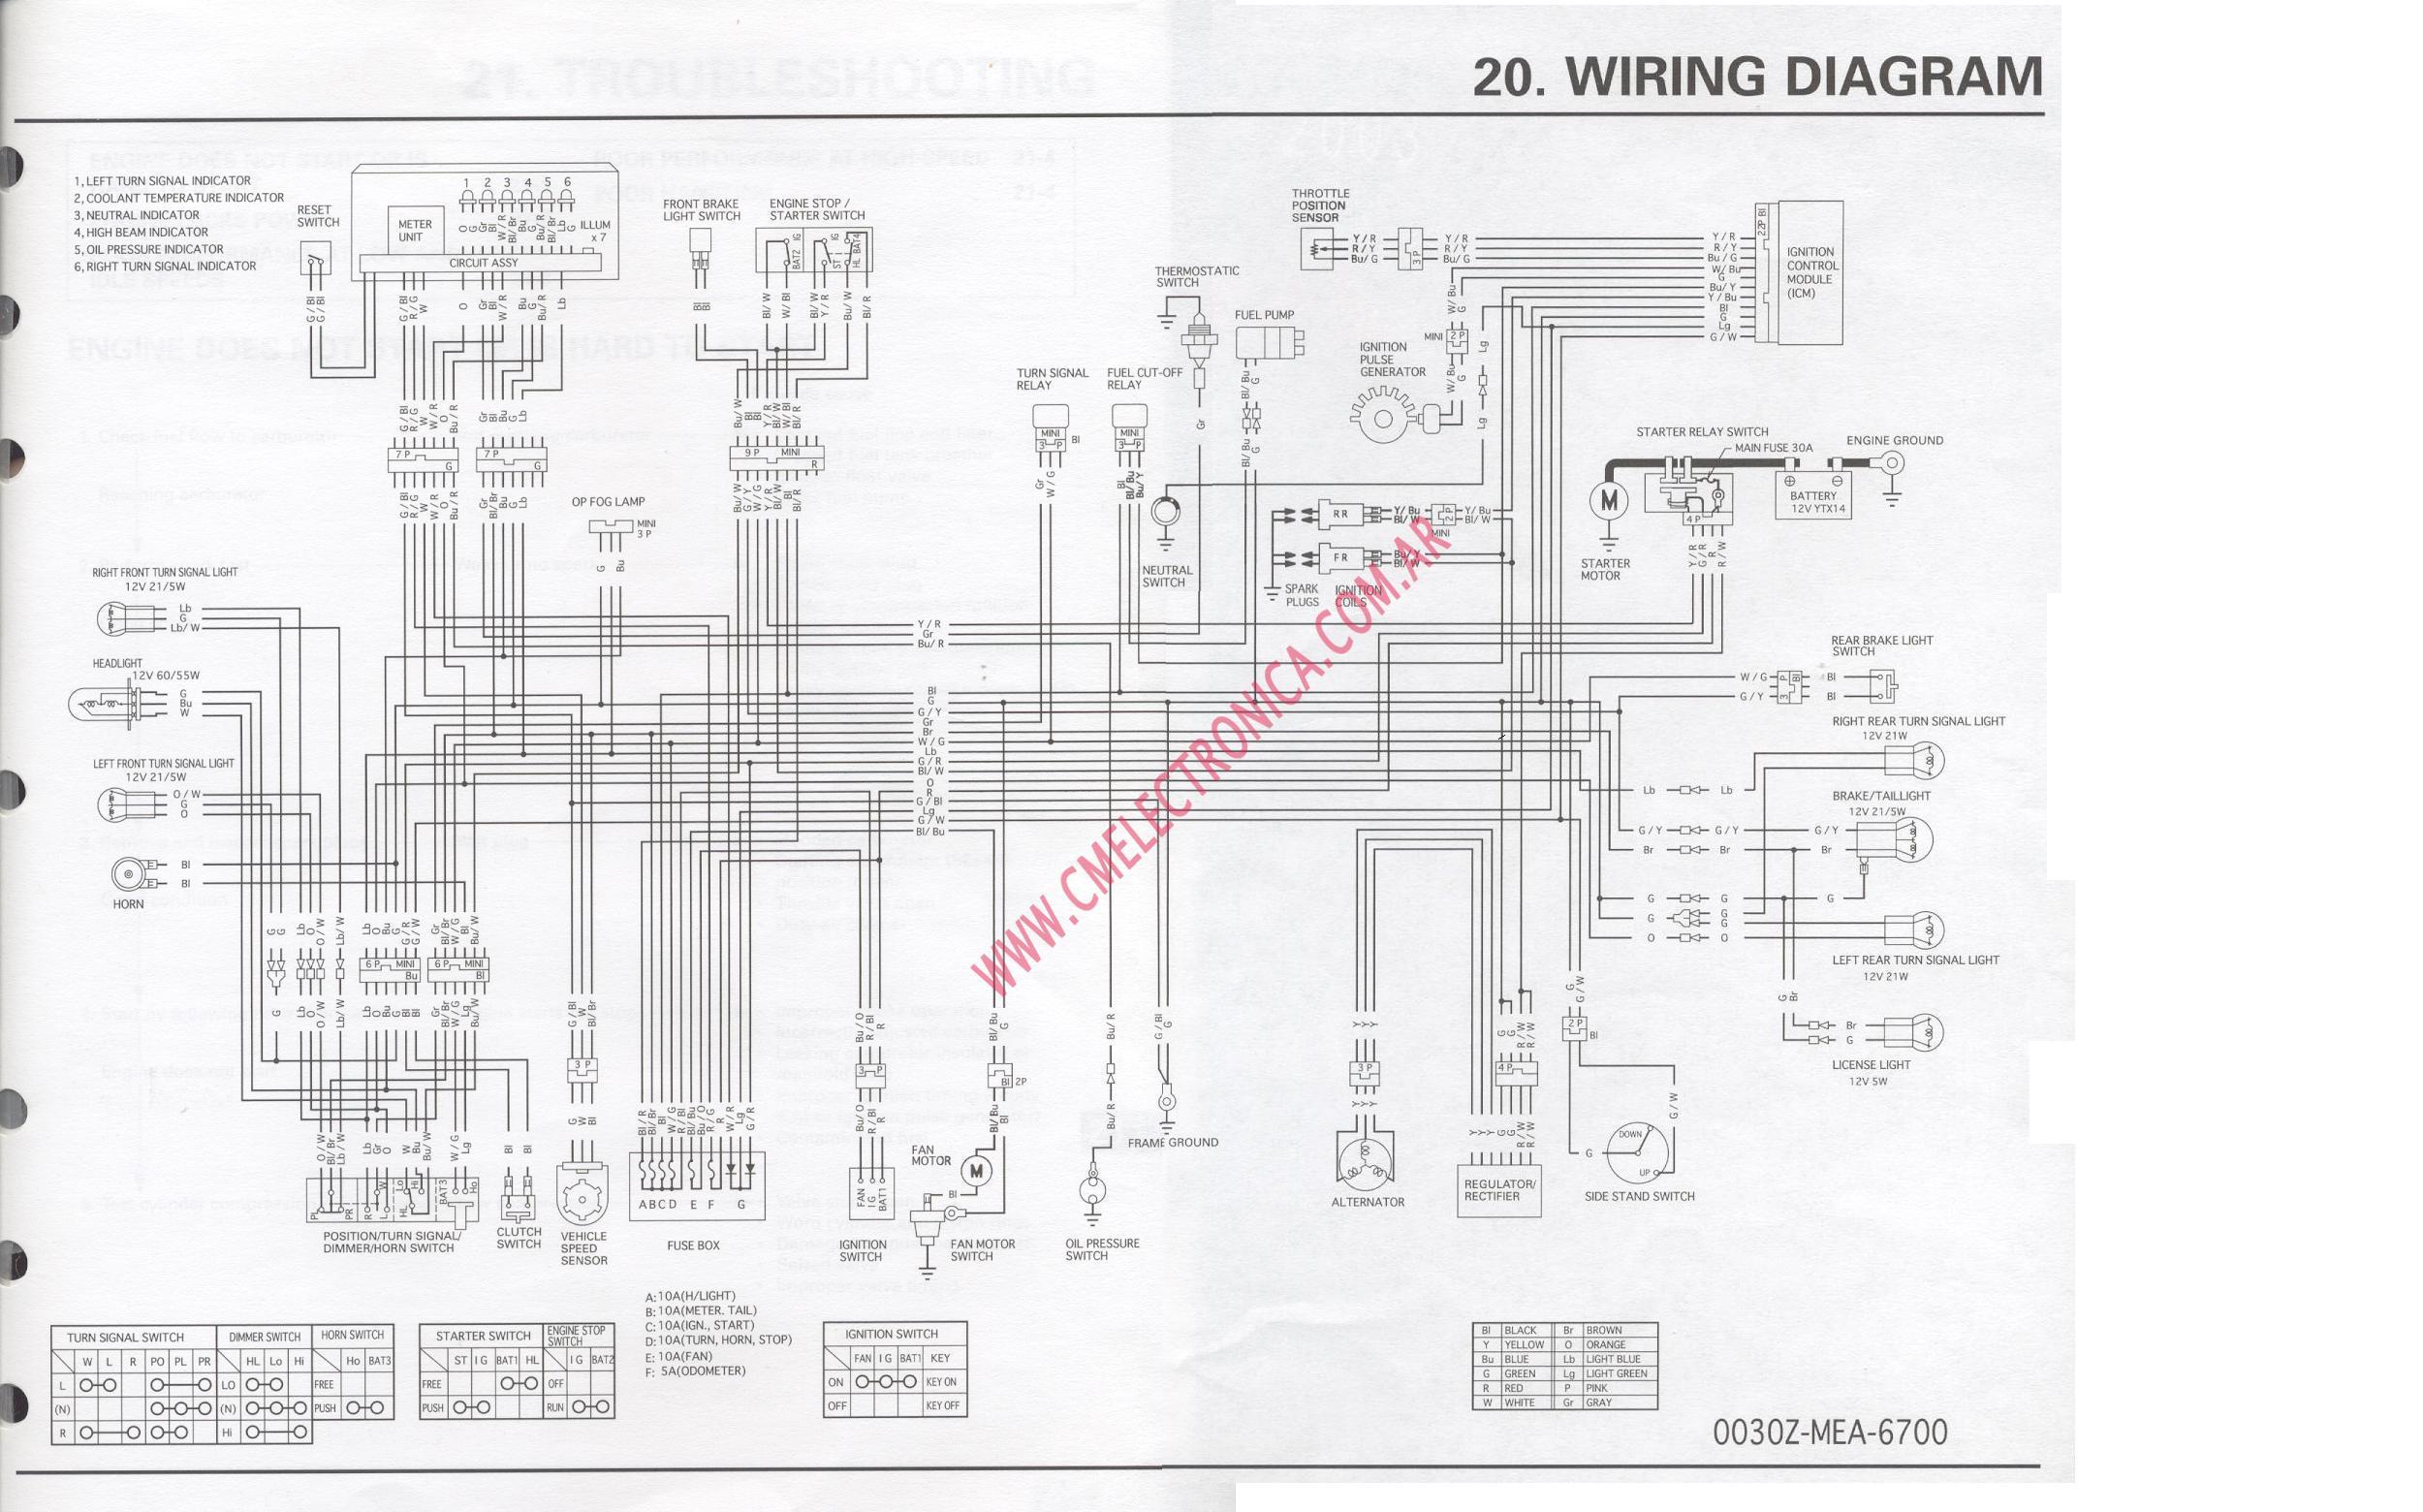 DIAGRAM] 2003 Honda Vtx 1300 Wiring Diagrams FULL Version HD Quality Wiring  Diagrams - SCHEMATICDESIGNERS.DZ-ART.FRschematicdesigners.dz-art.fr